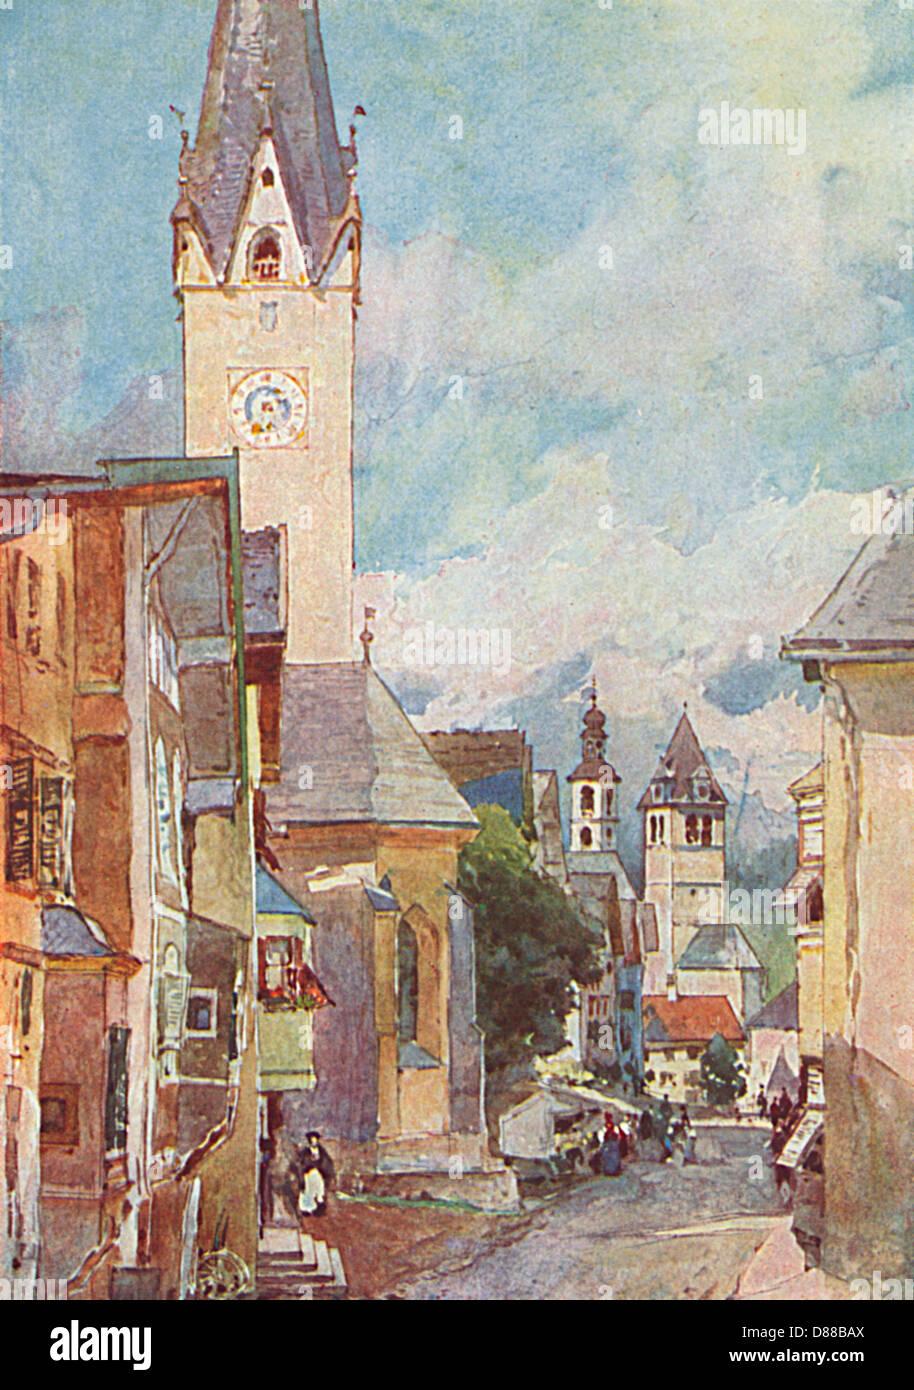 Austria Kitzbuhel 1931 - Stock Image